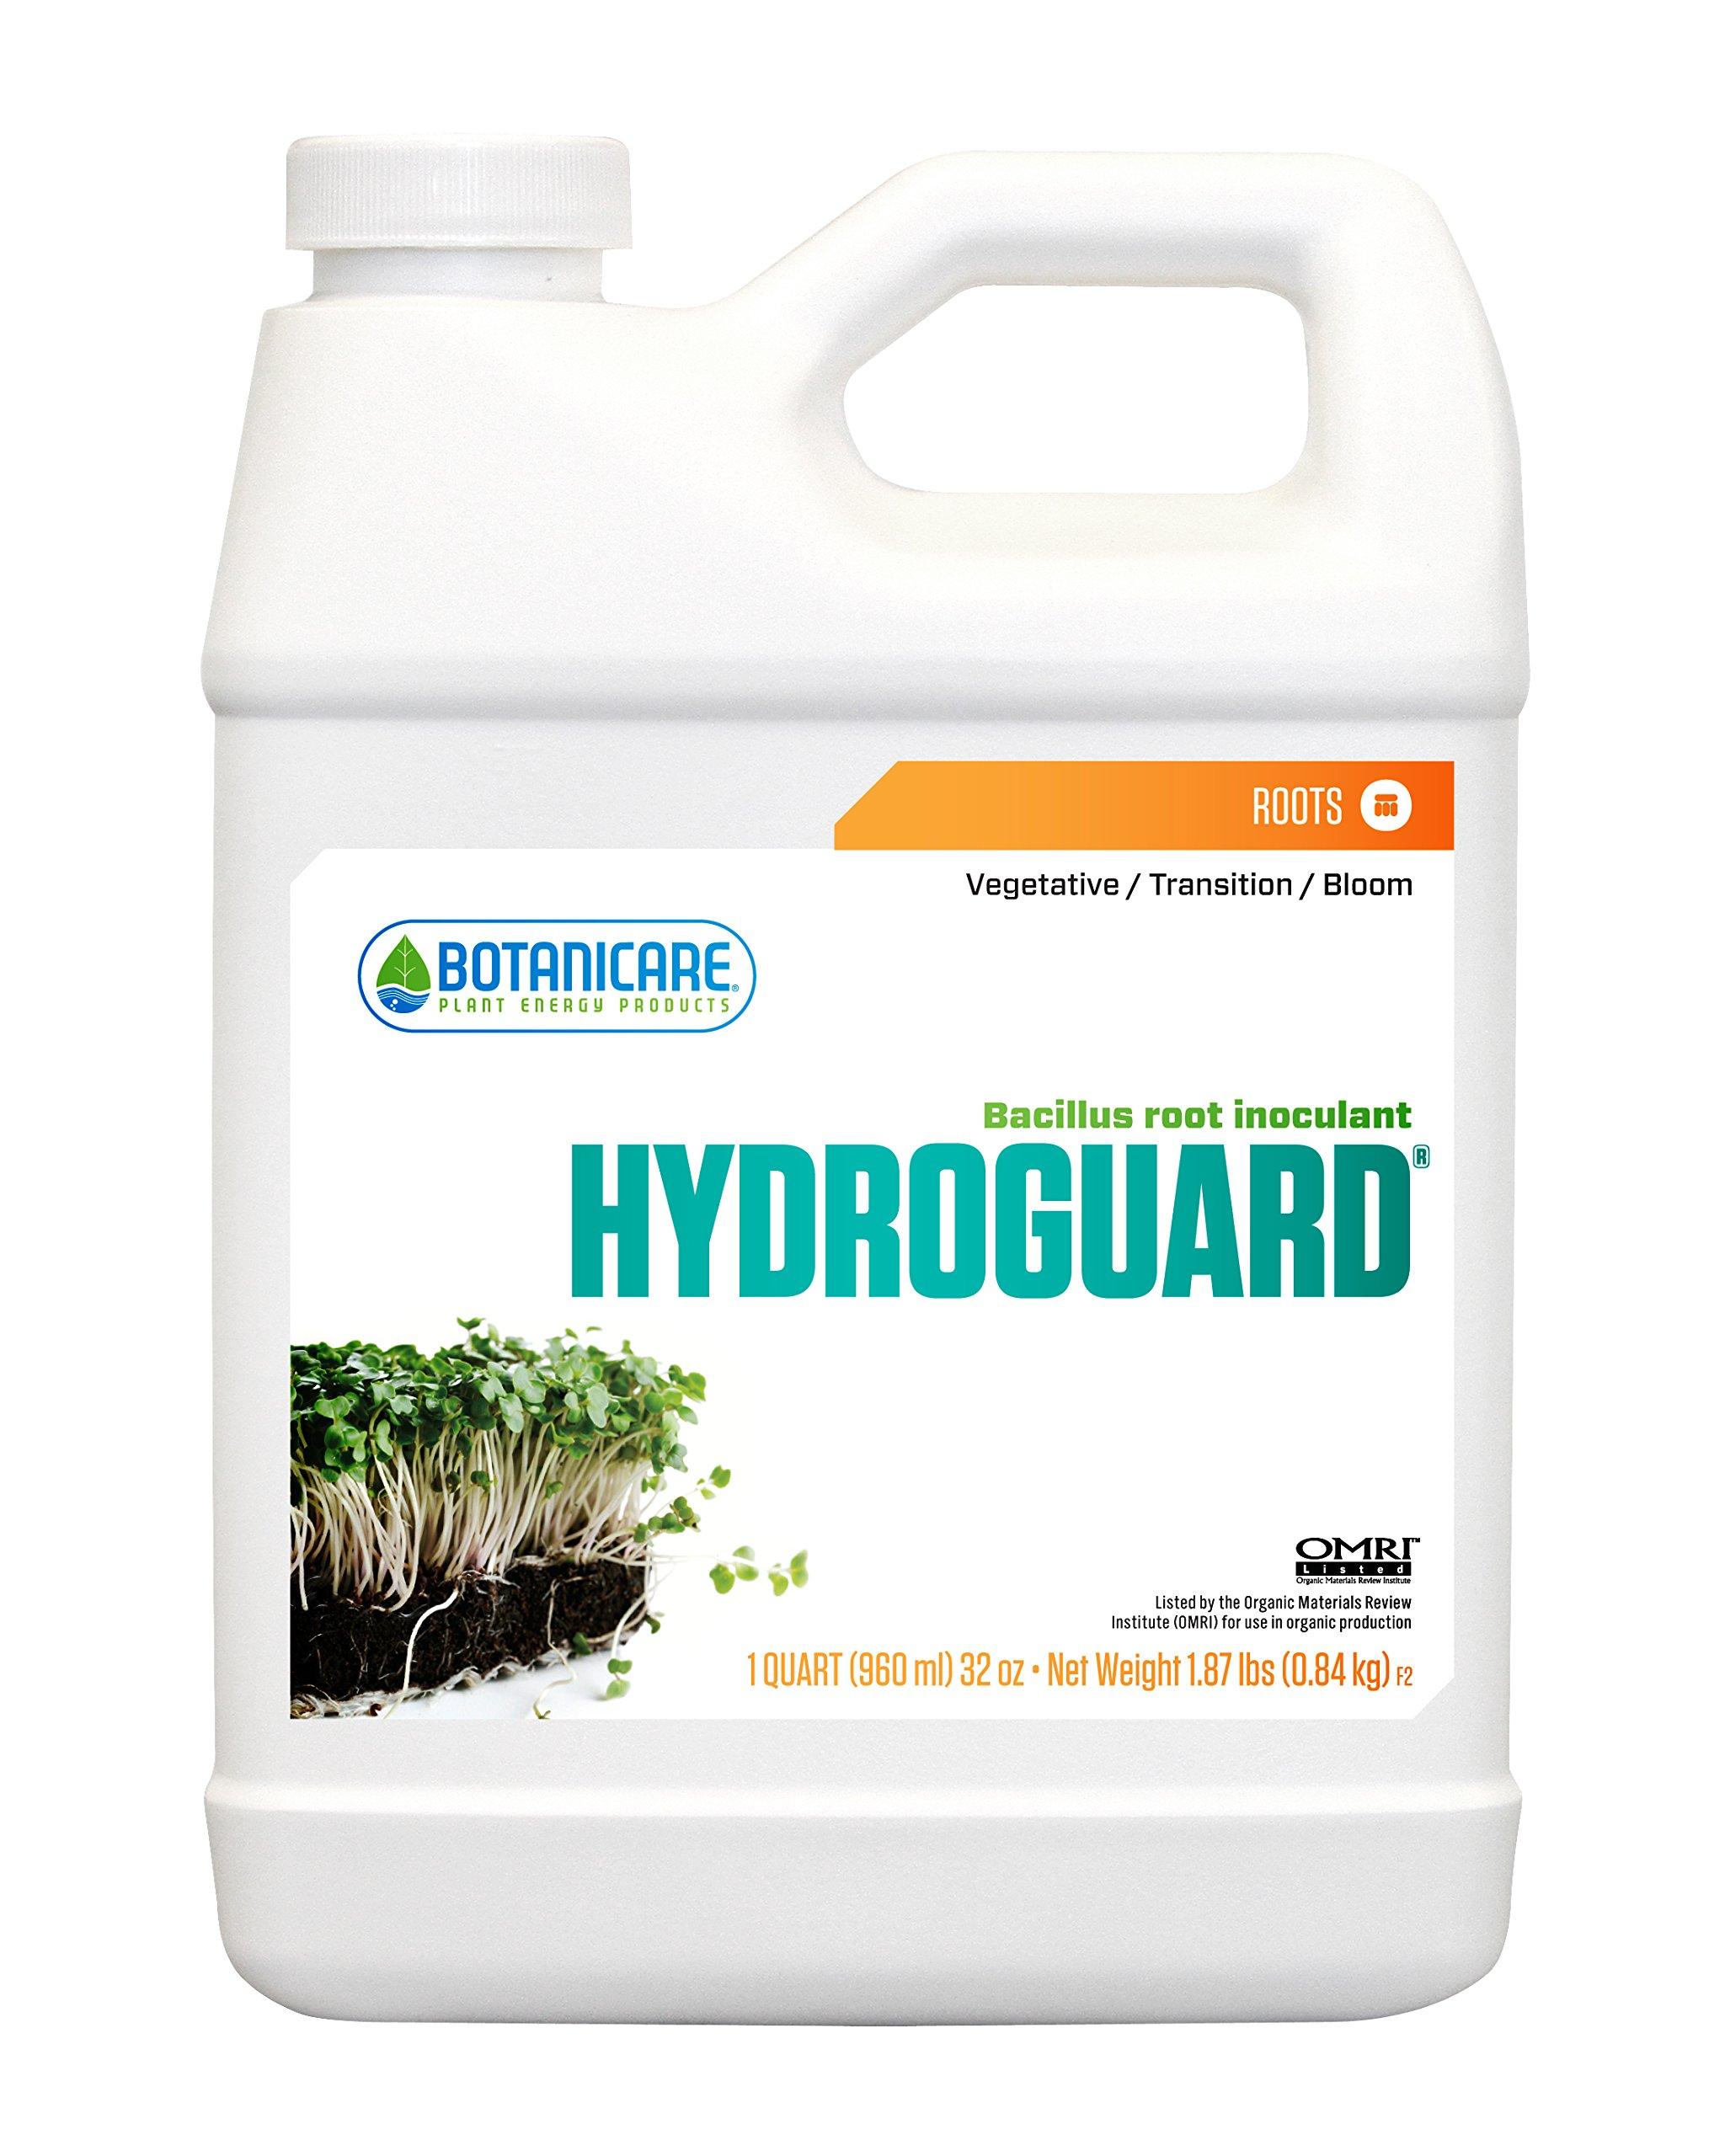 Botanicare HYDROGUARD Bacillus Root Inoculant, 1-Quart